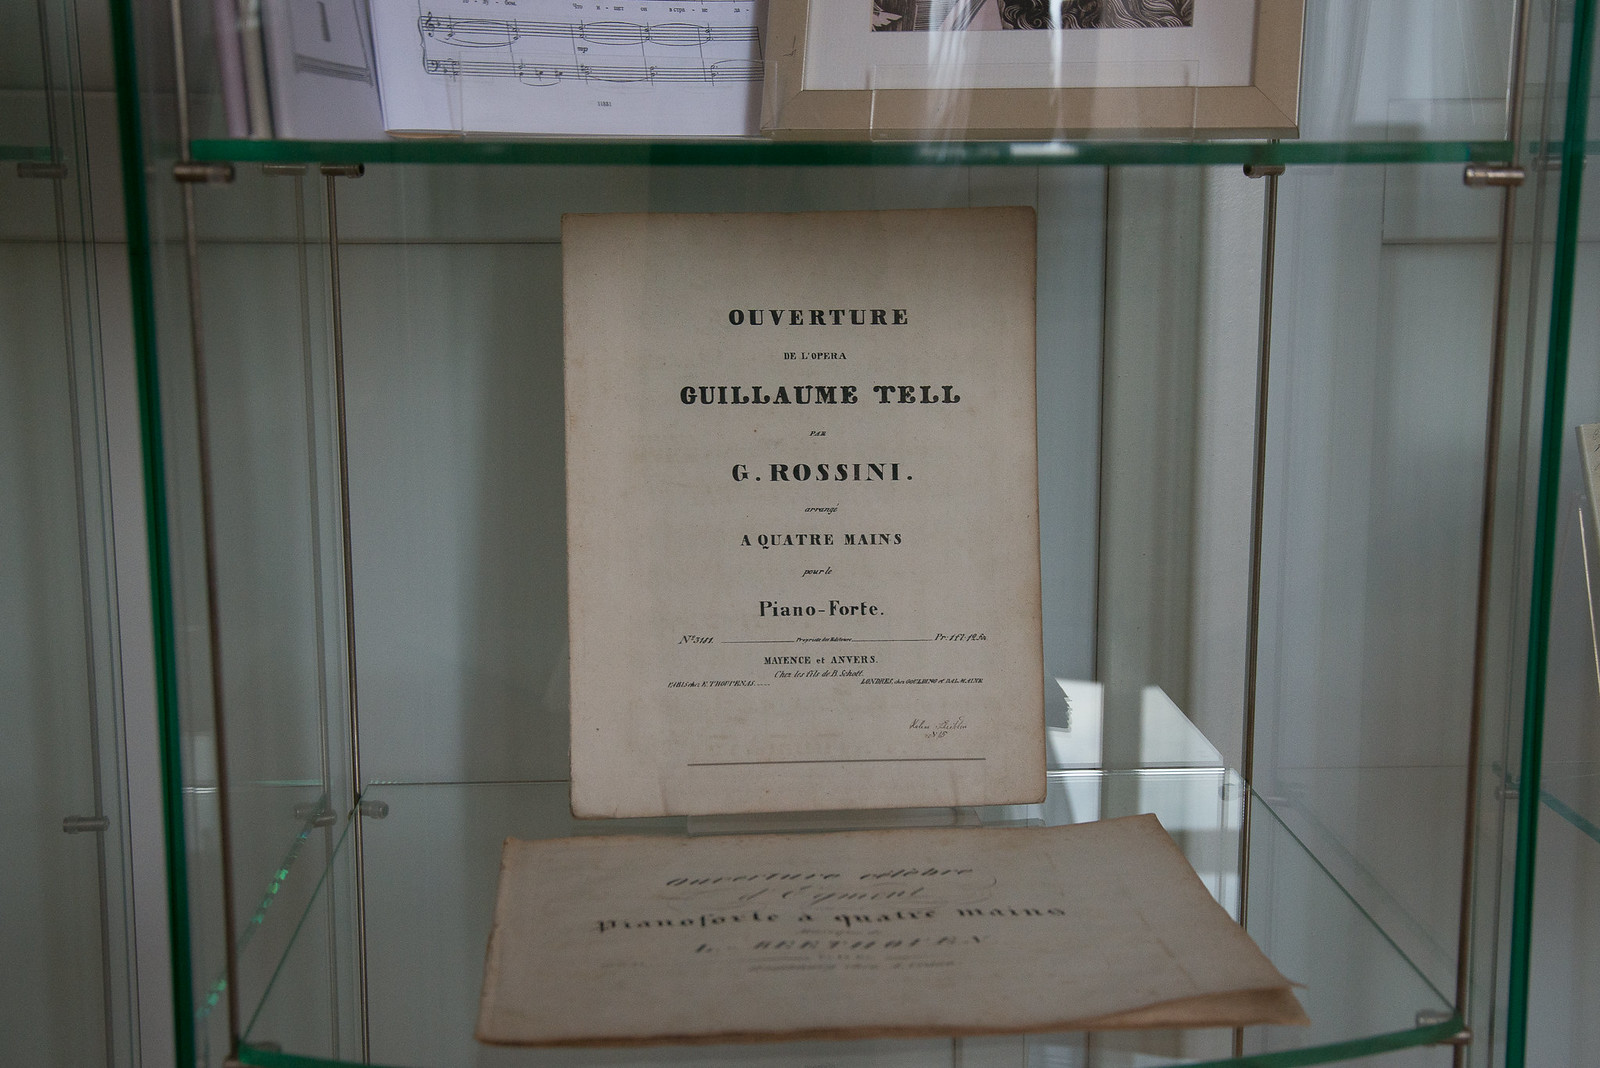 Ноты. Л. Бетховен. Увертюра к опере «Эгмонт». 1830. Ноты. Д. А. Россини. Увертюра к опере «Вильгельм Телль». 1829